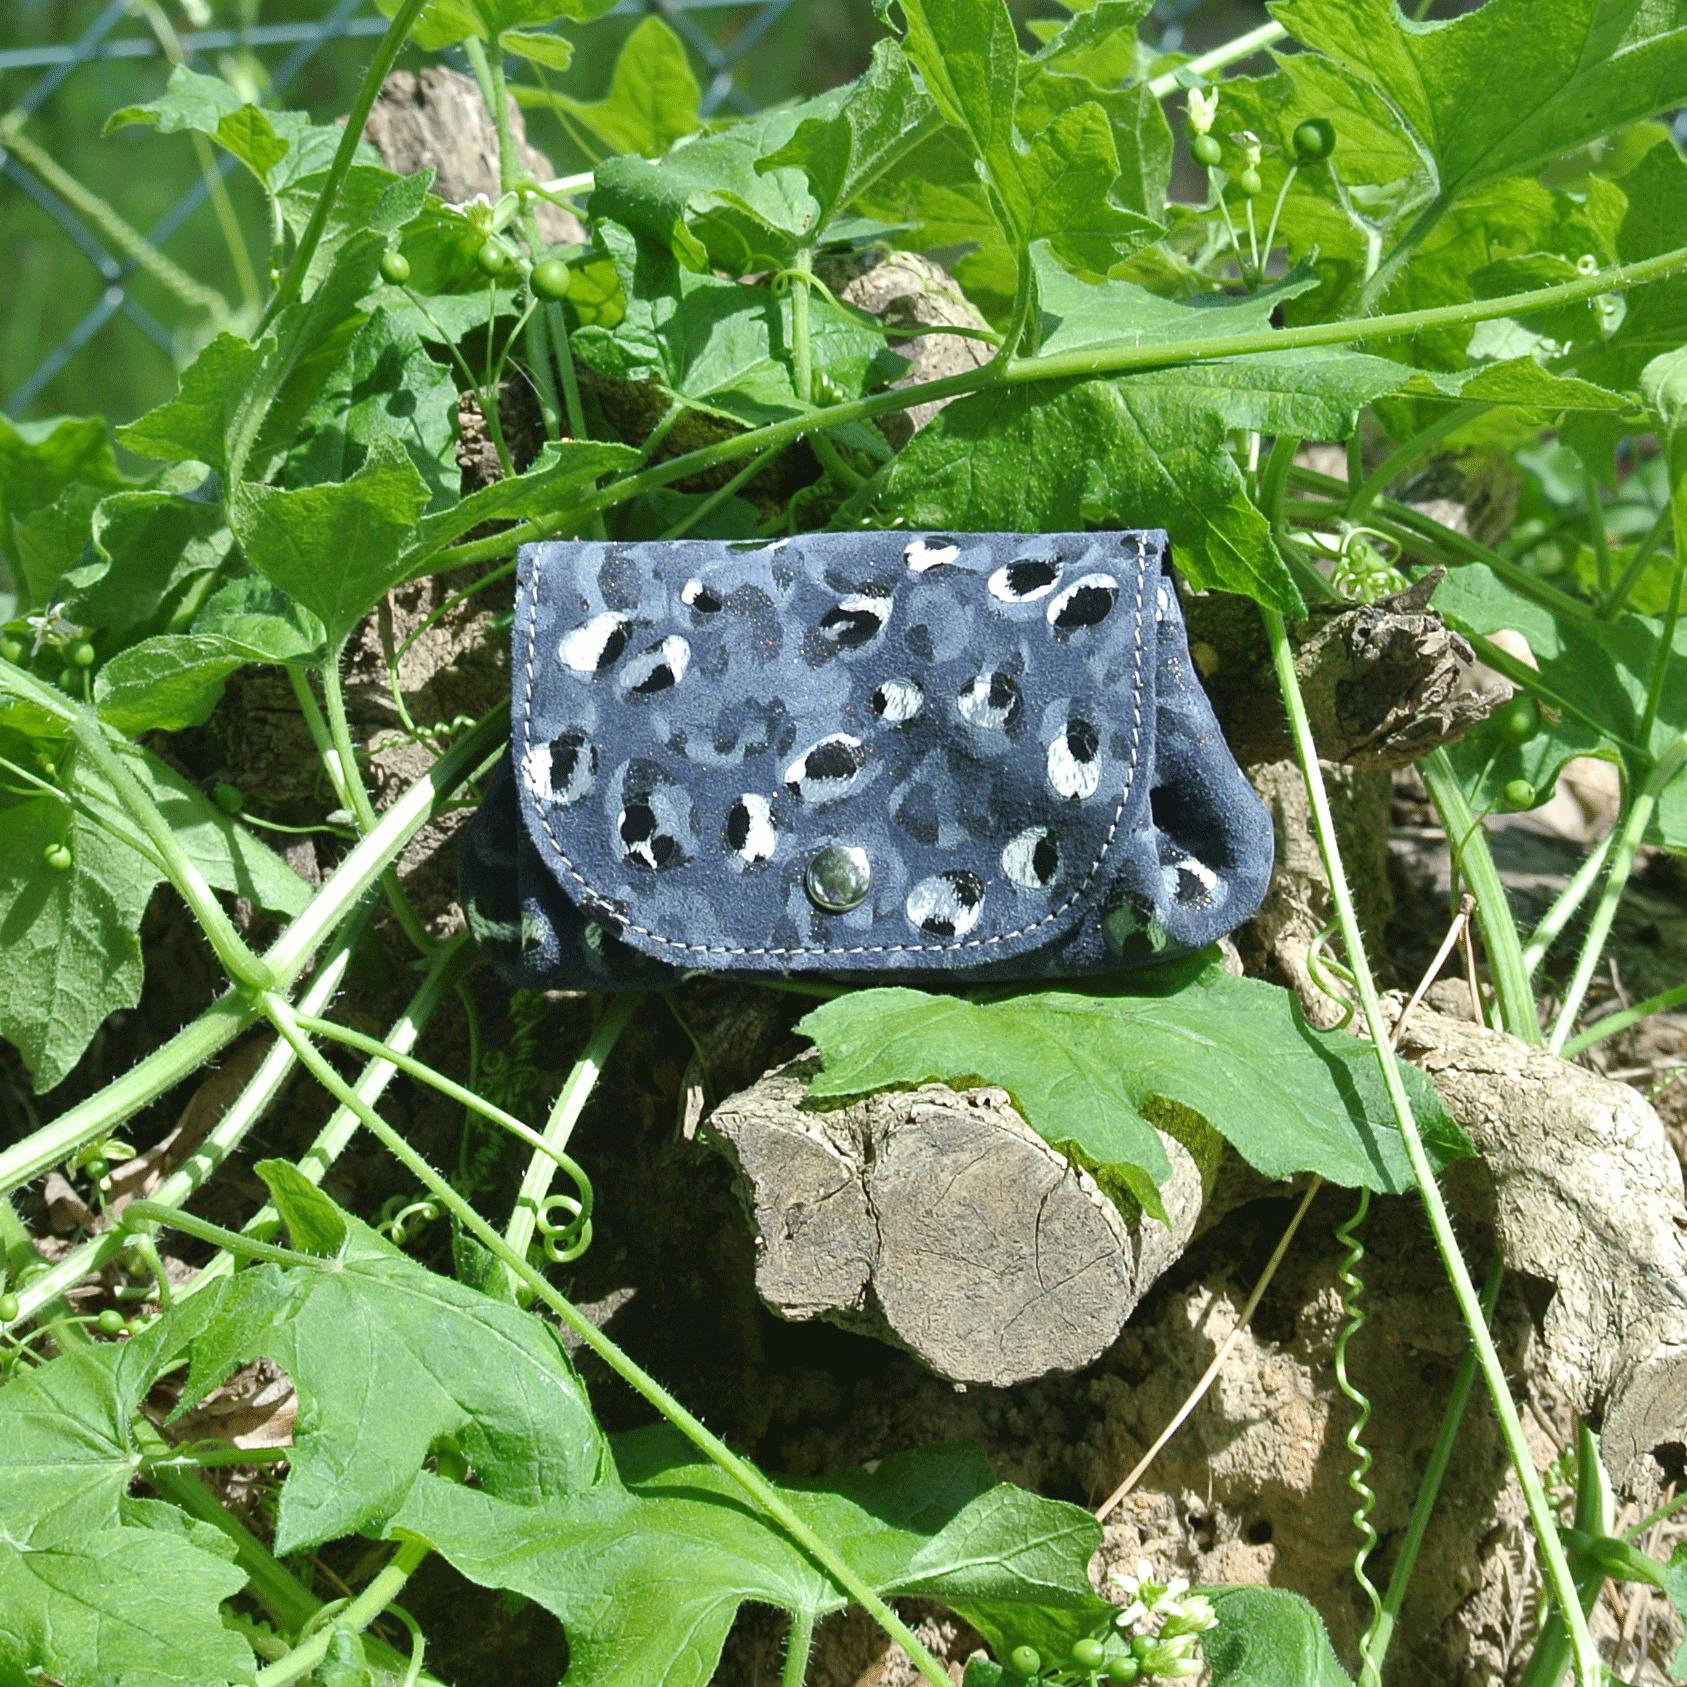 cuirs-fantaisies-la-cartabliere-fabrique-en-france-porte-monnaie-accordeon-en-cuir-plume-bleu-ardoise